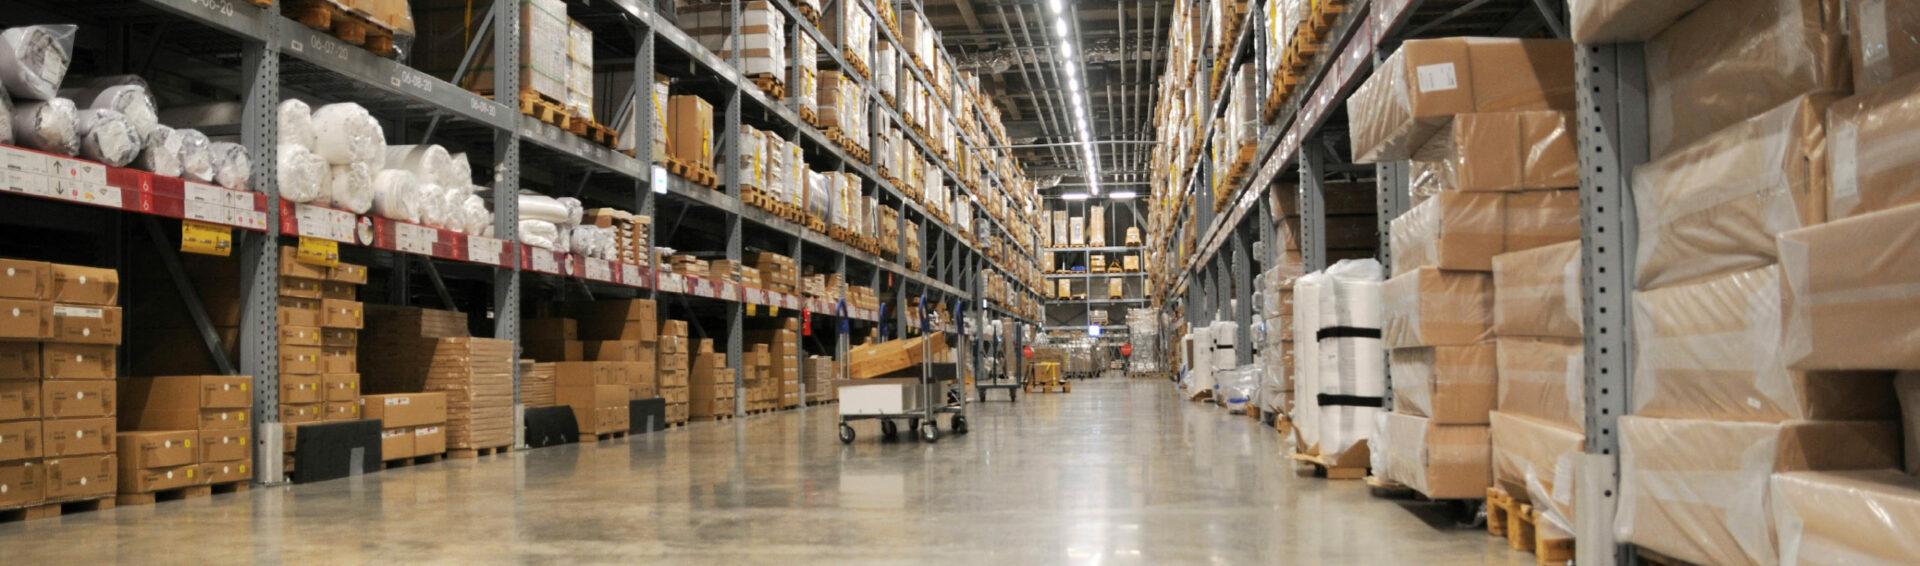 Inventory control 1